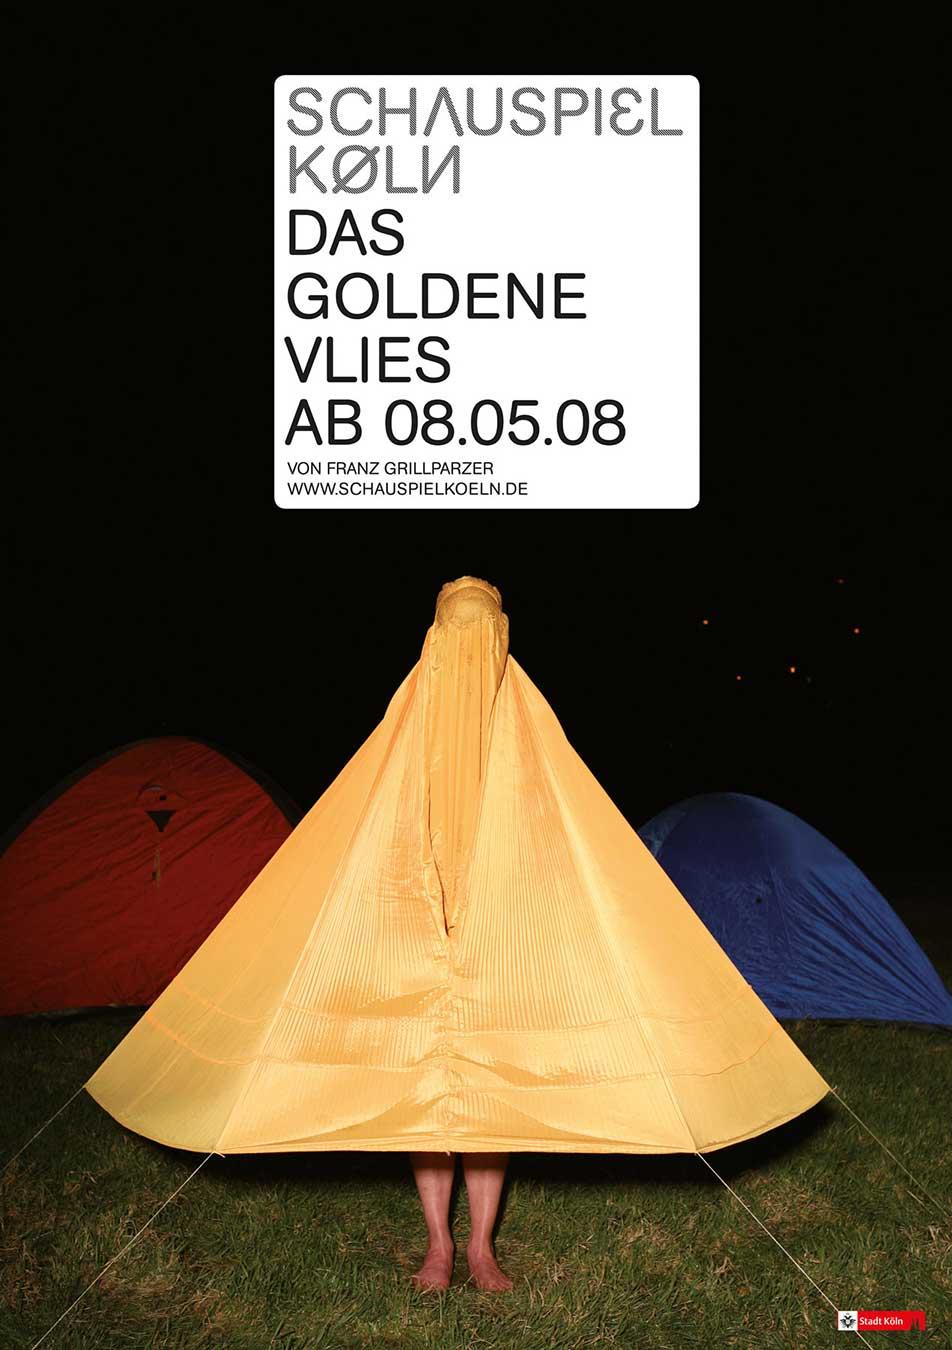 Schauspiel Köln Plakat 2008 Kampagne